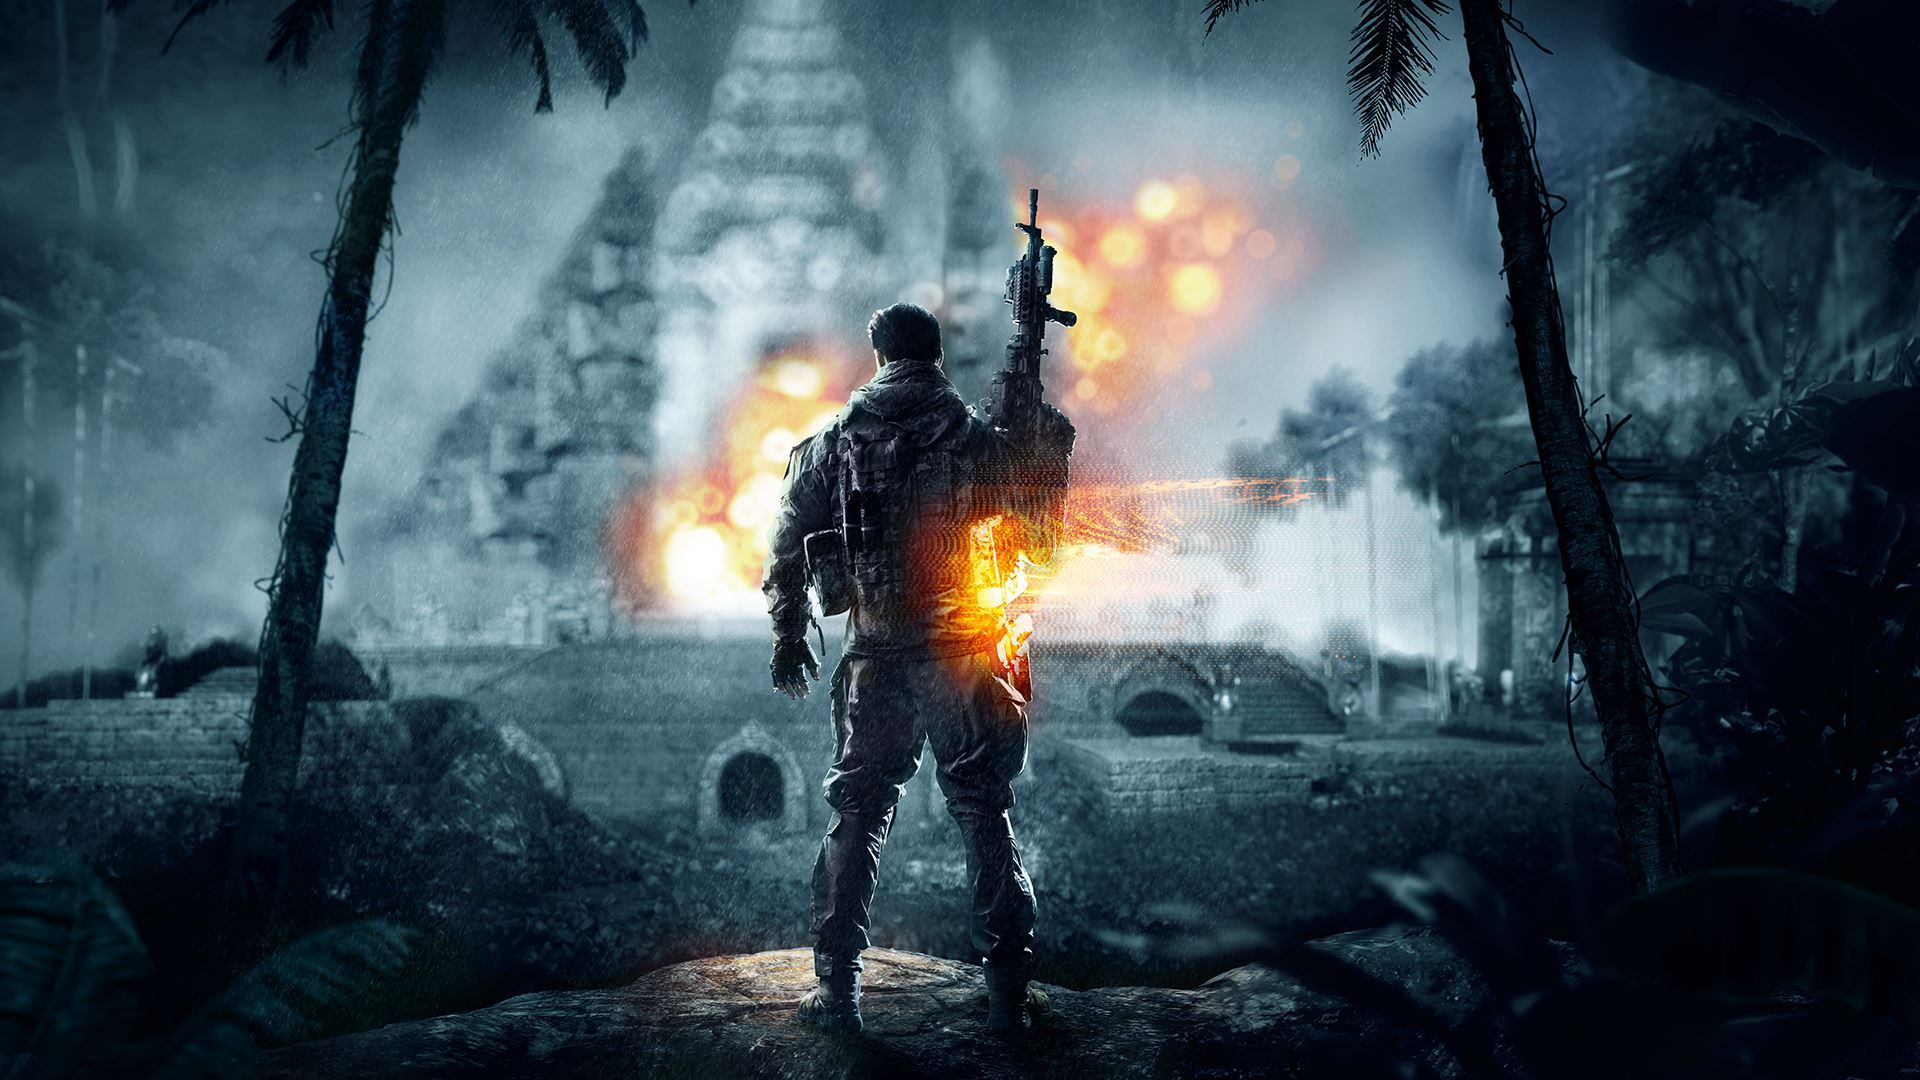 Battlefield 4 Community Operations Wallpaper Desktop Backgrounds Best Wallpapers Hq